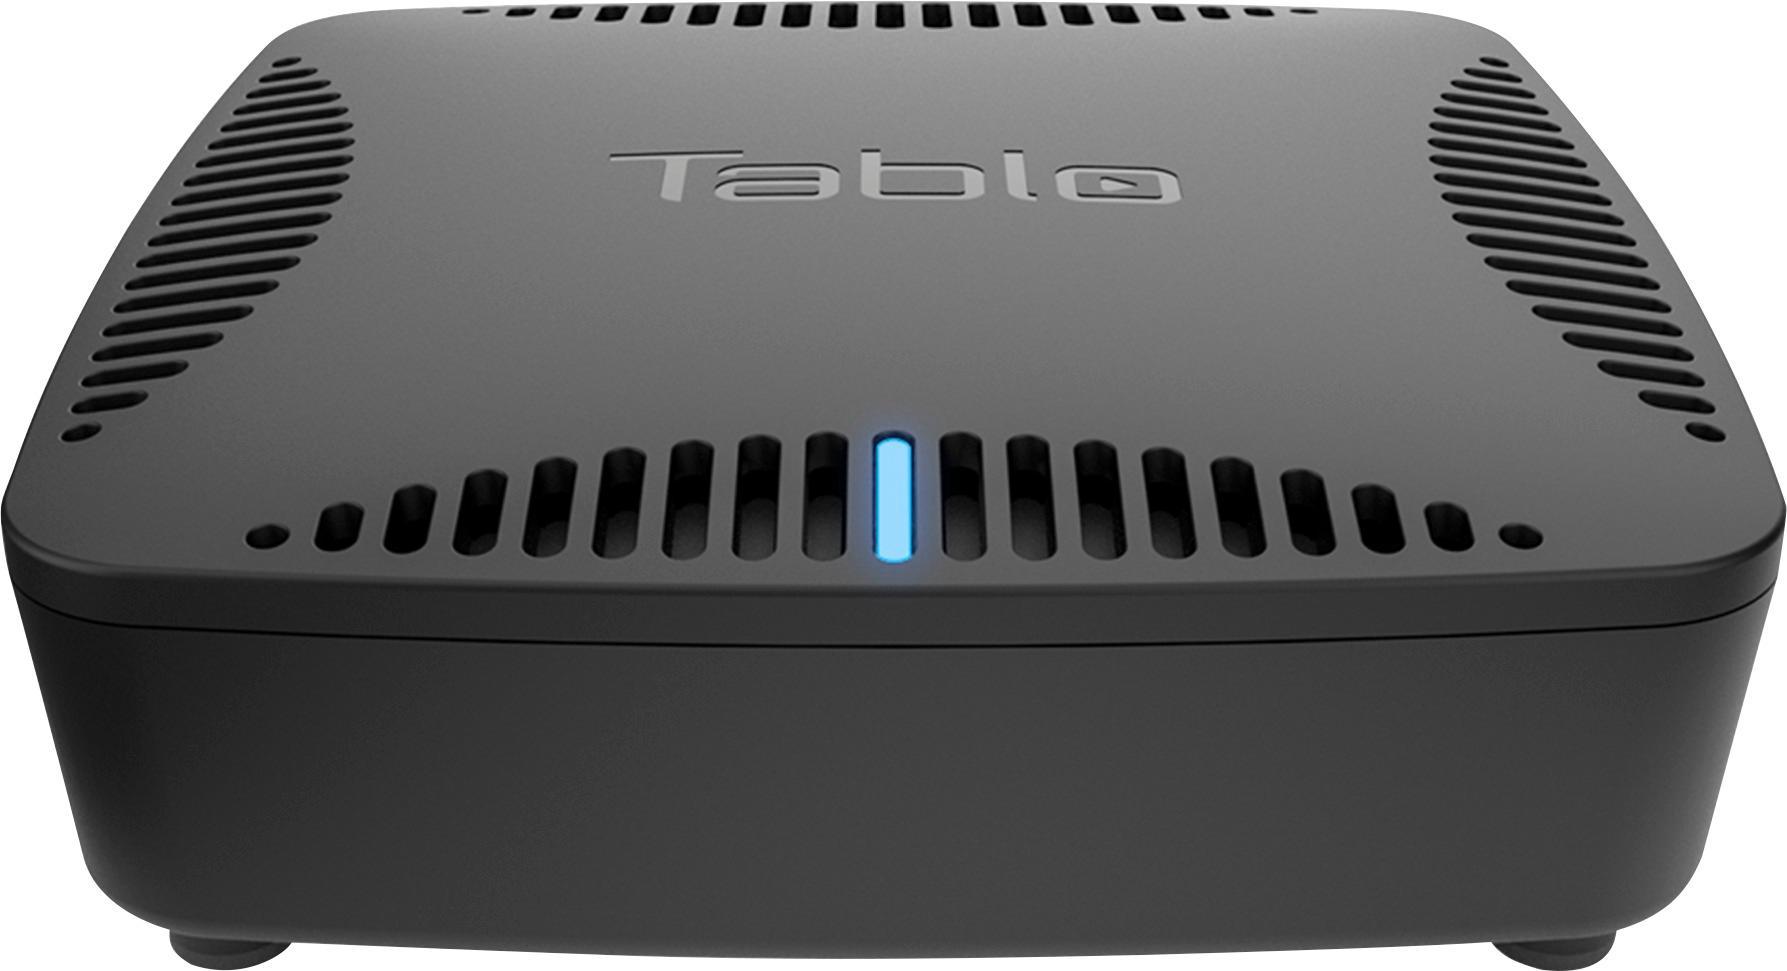 Tablo DUAL 64GB OTA DVR with WiFi Black SPVR2-02-EN